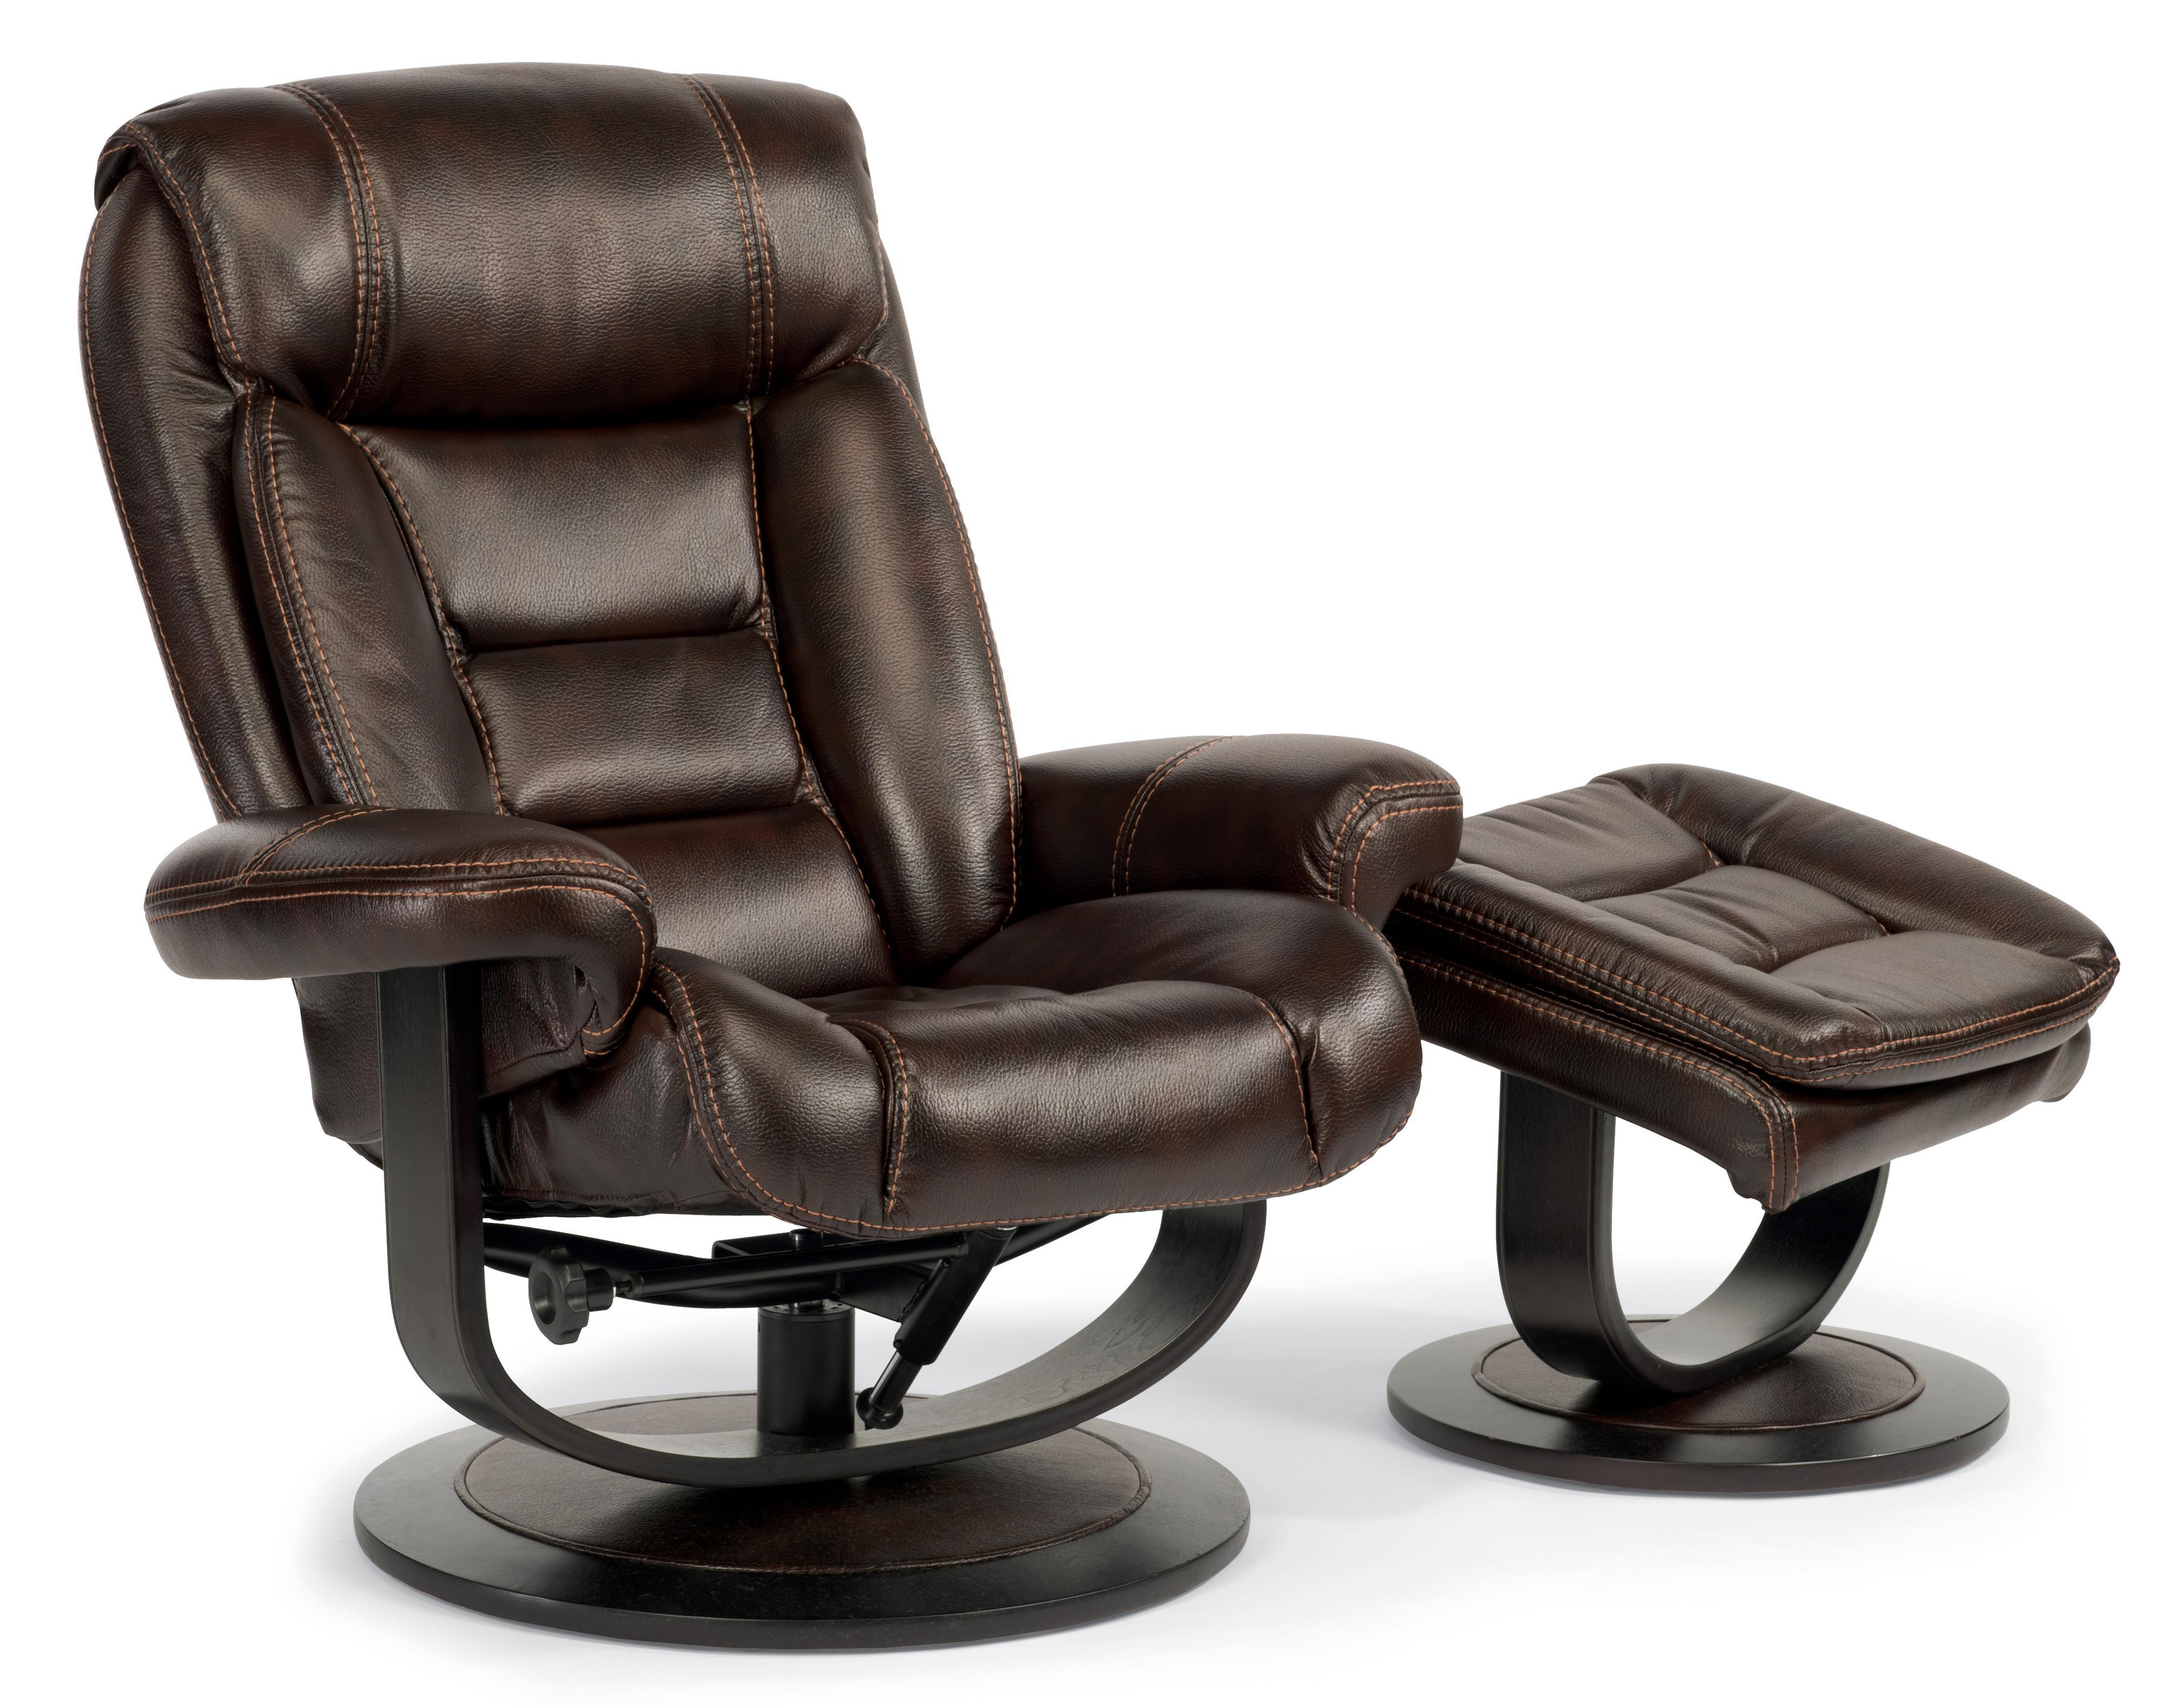 Flexsteel Latitudes Hunter Reclining Chair And Ottoman Set   Item Number:  1454 CO